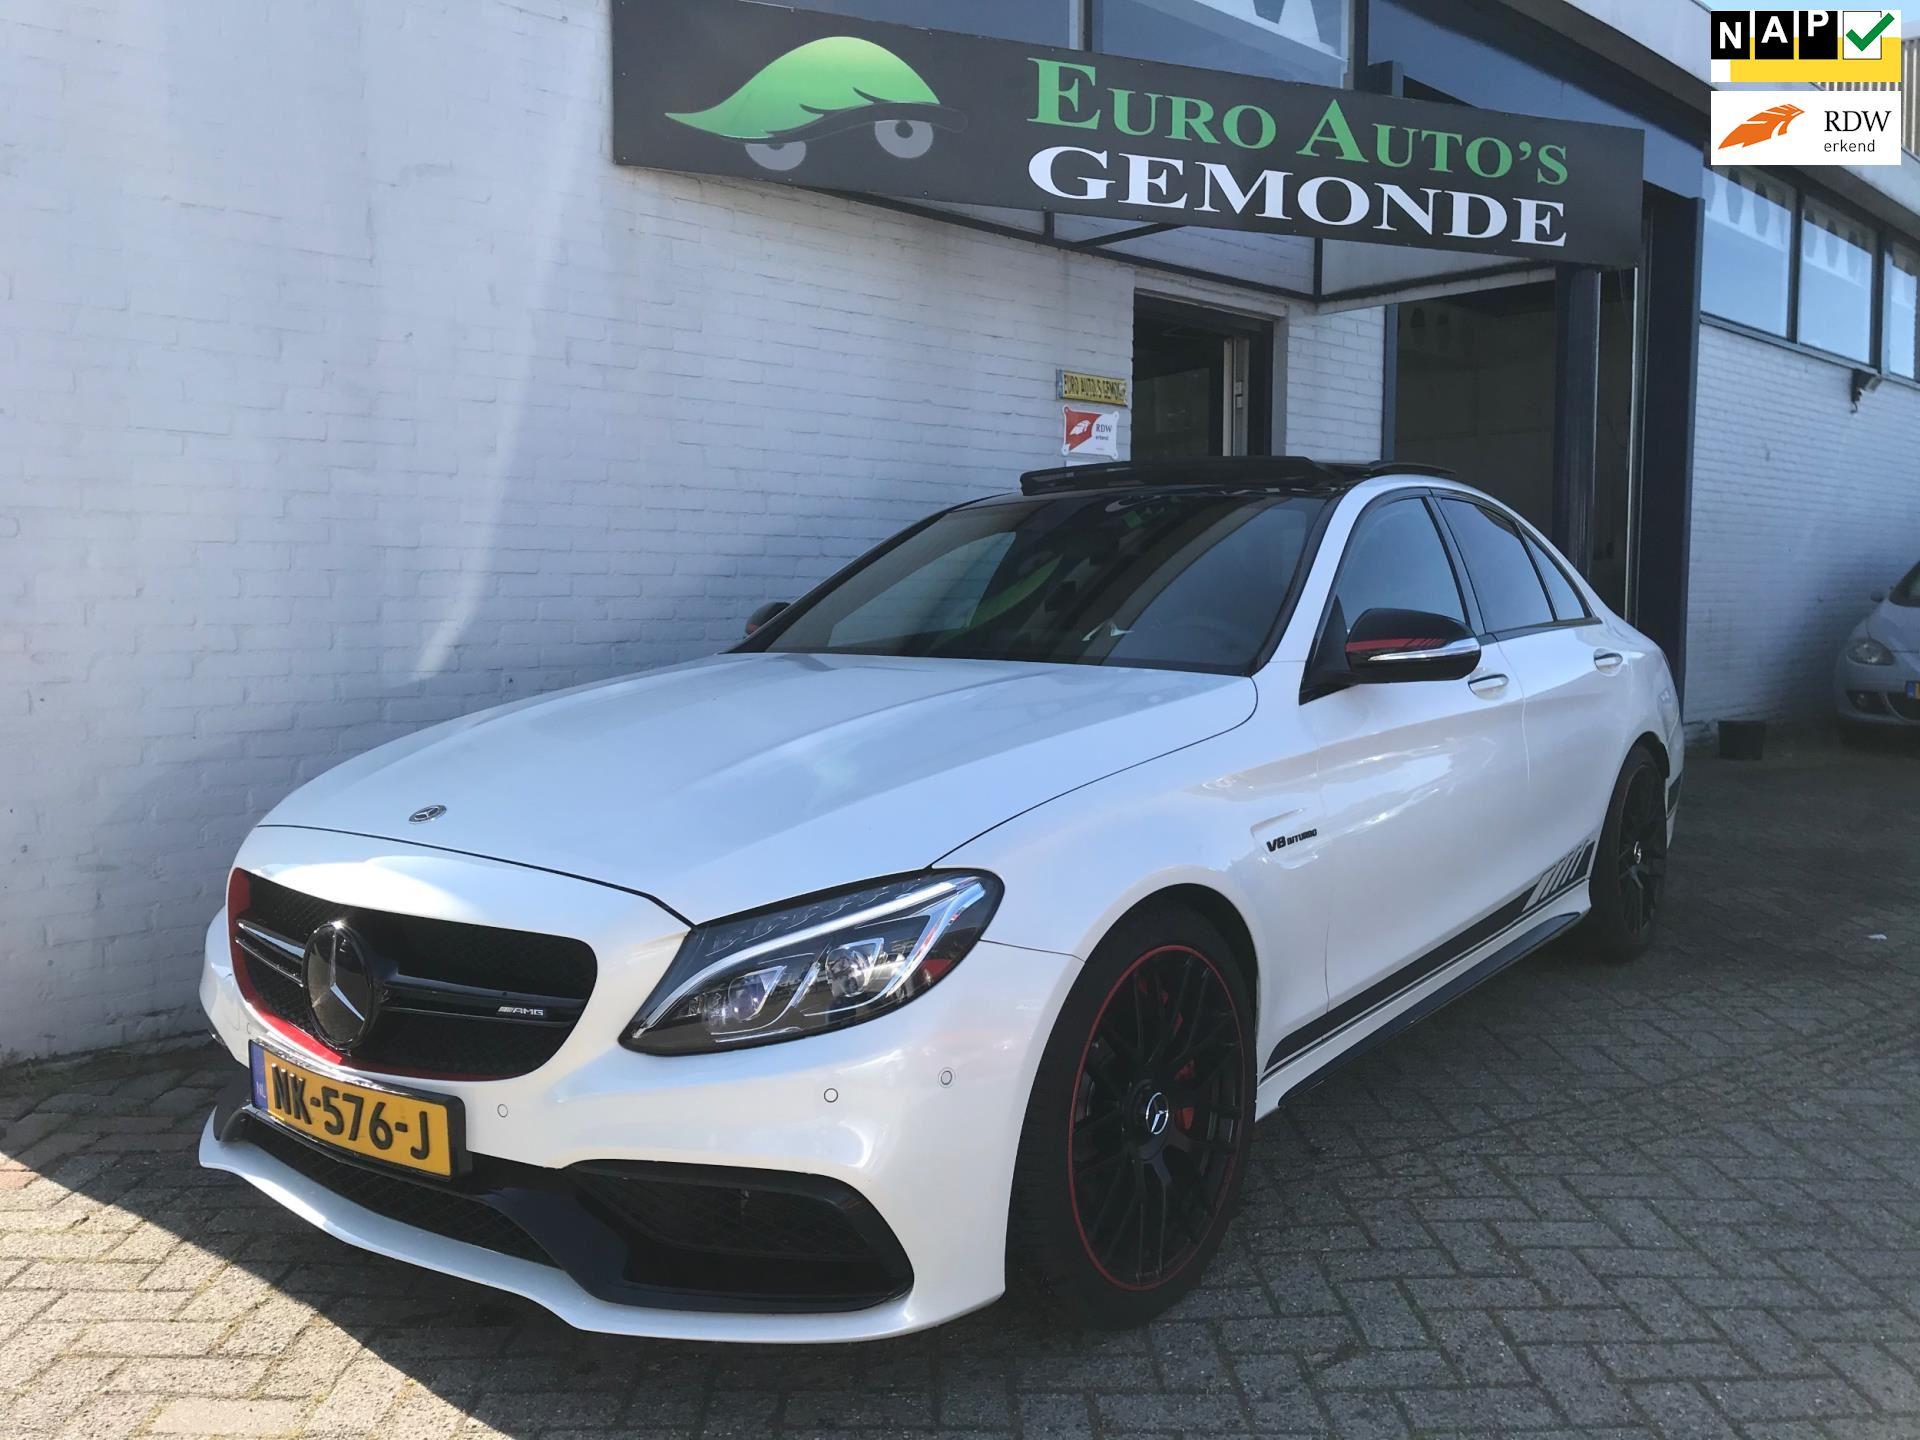 Mercedes-Benz C63s occasion - Euro Auto's Gemonde